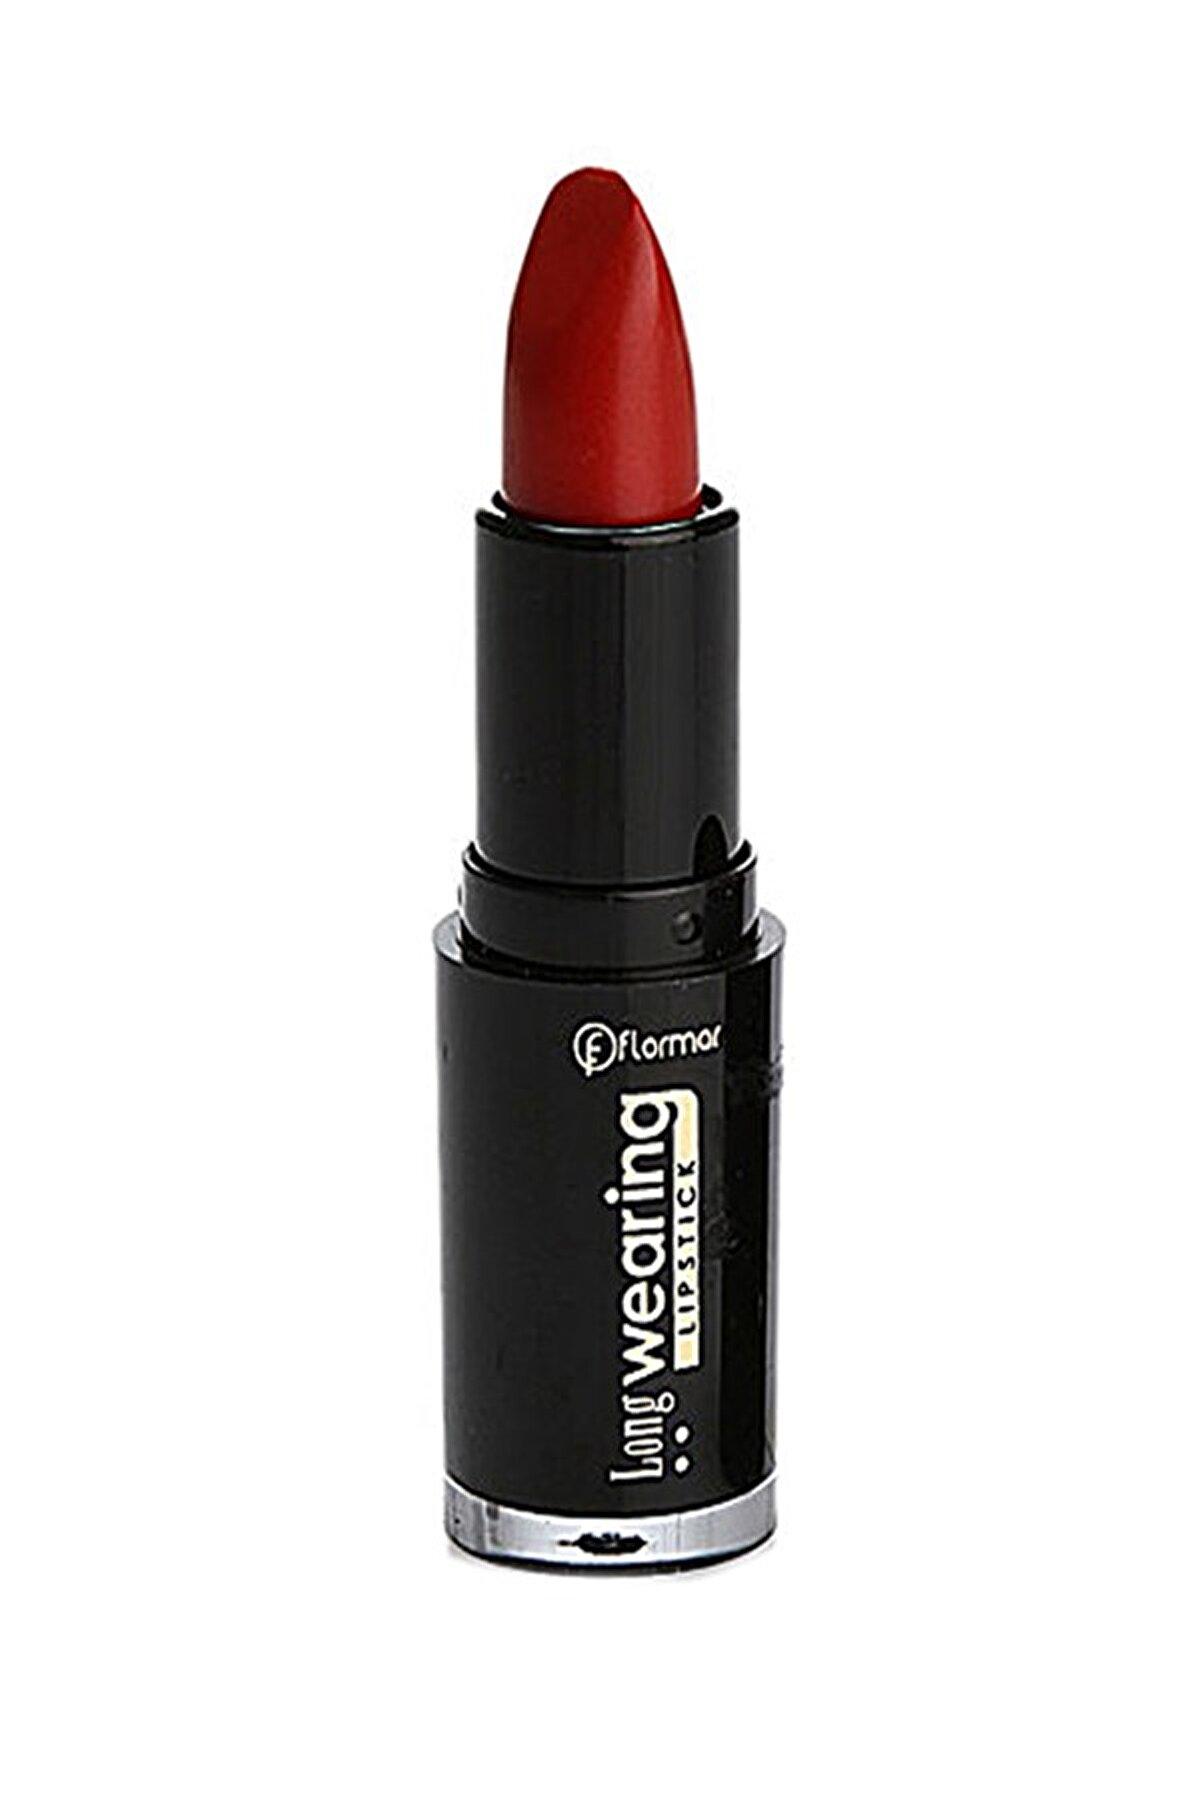 Flormar Ruj - Long Wearing Lipstick Red Metallic L08 8690604107780